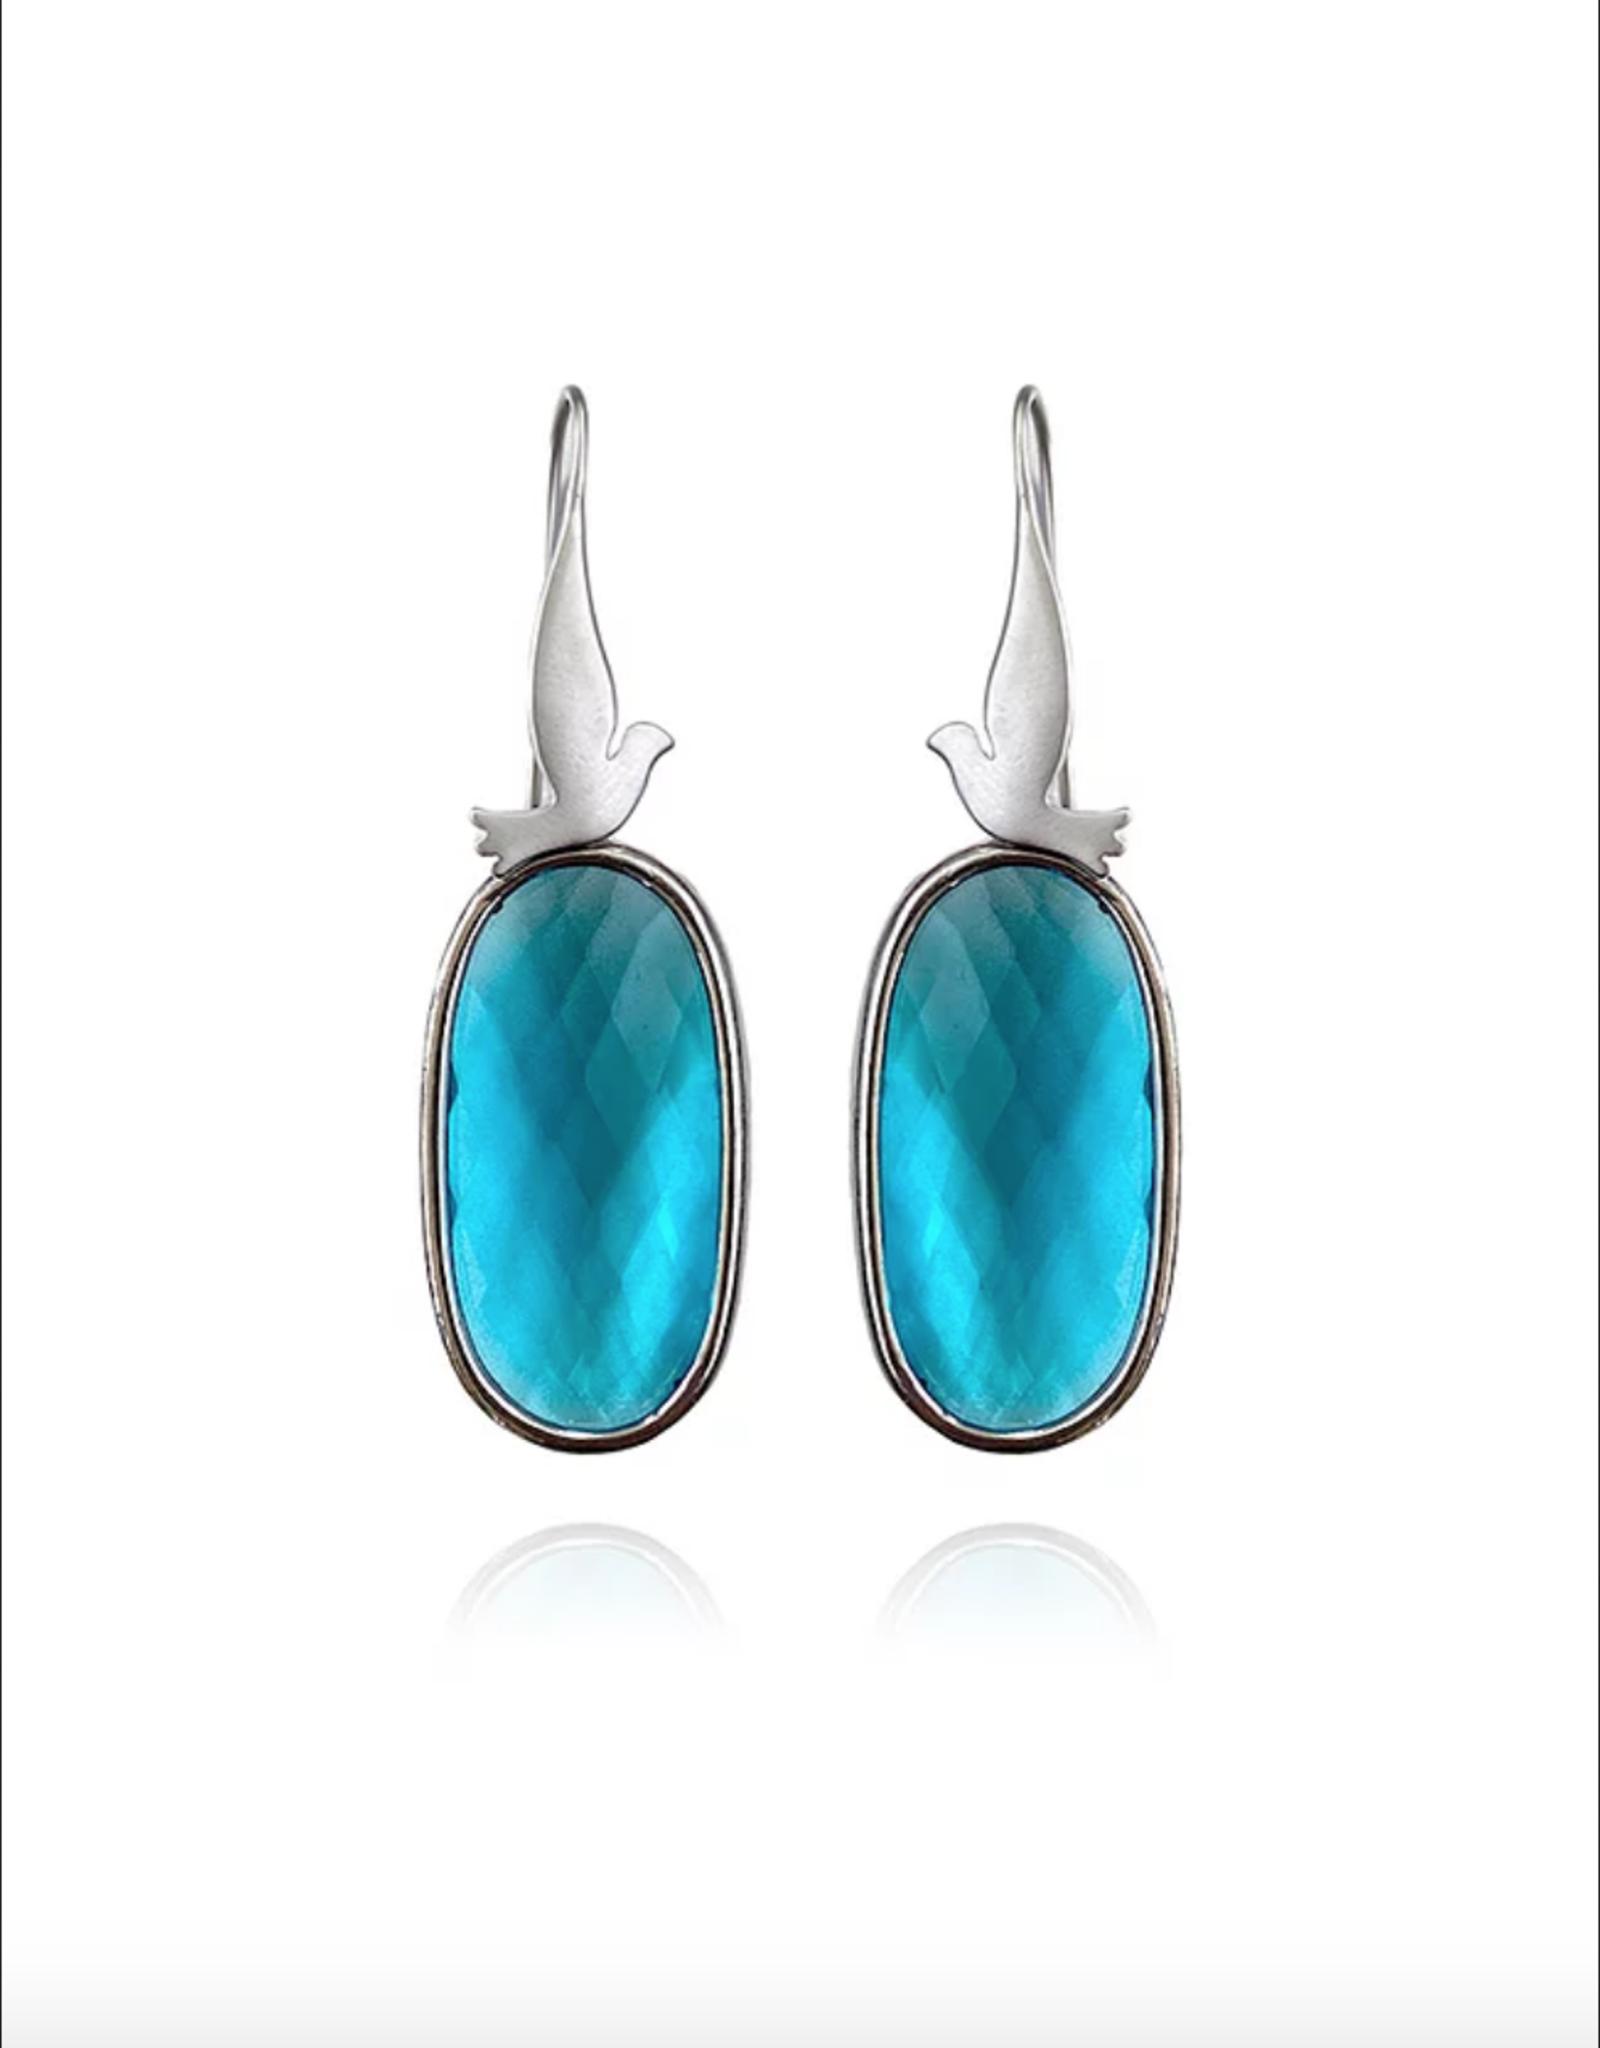 Lakoo Designs Silver Bird Big Blue Crystal Earrings